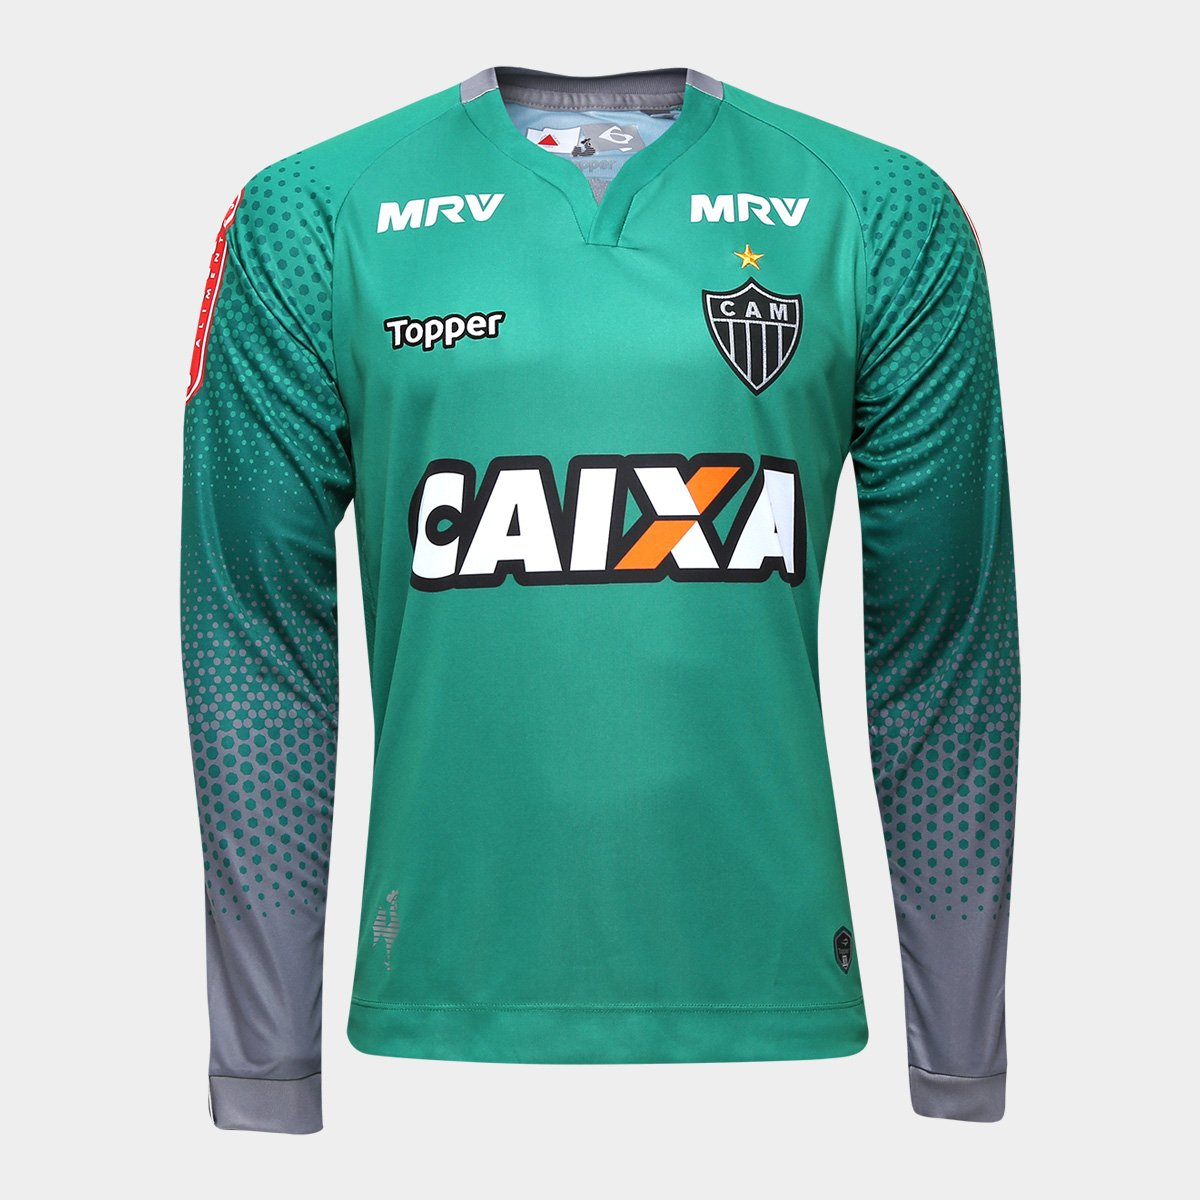 8fb186f869 Camisa Atlético-MG Goleiro III 17 18 Manga Longa nº 1 - Torcedor Topper  Masculina - Compre Agora